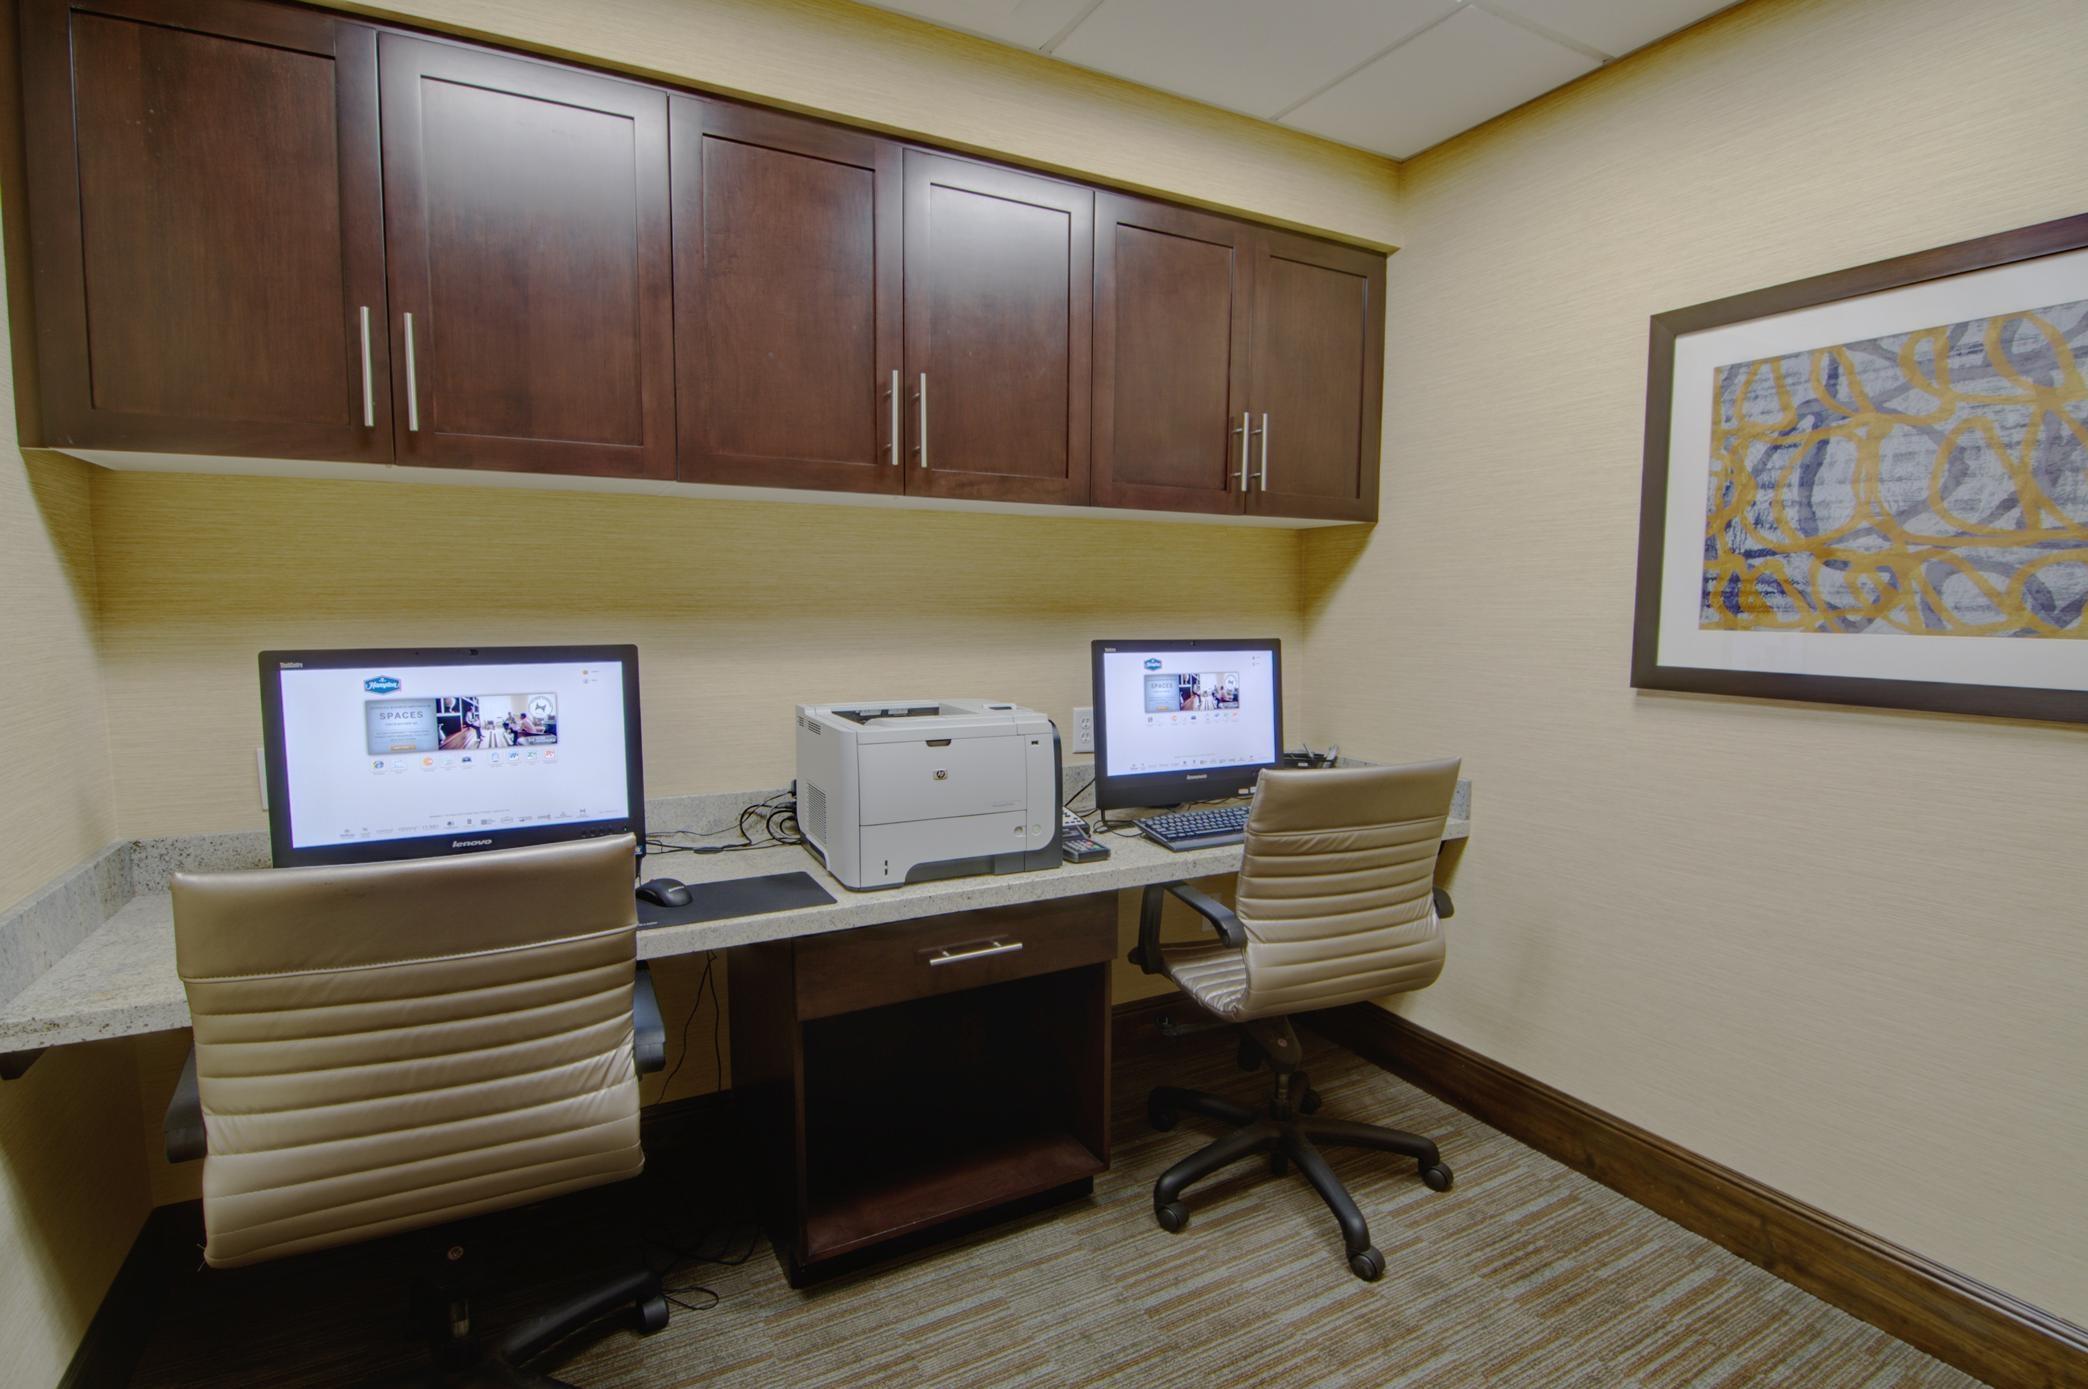 Hampton Inn & Suites Trophy Club - Fort Worth North image 16